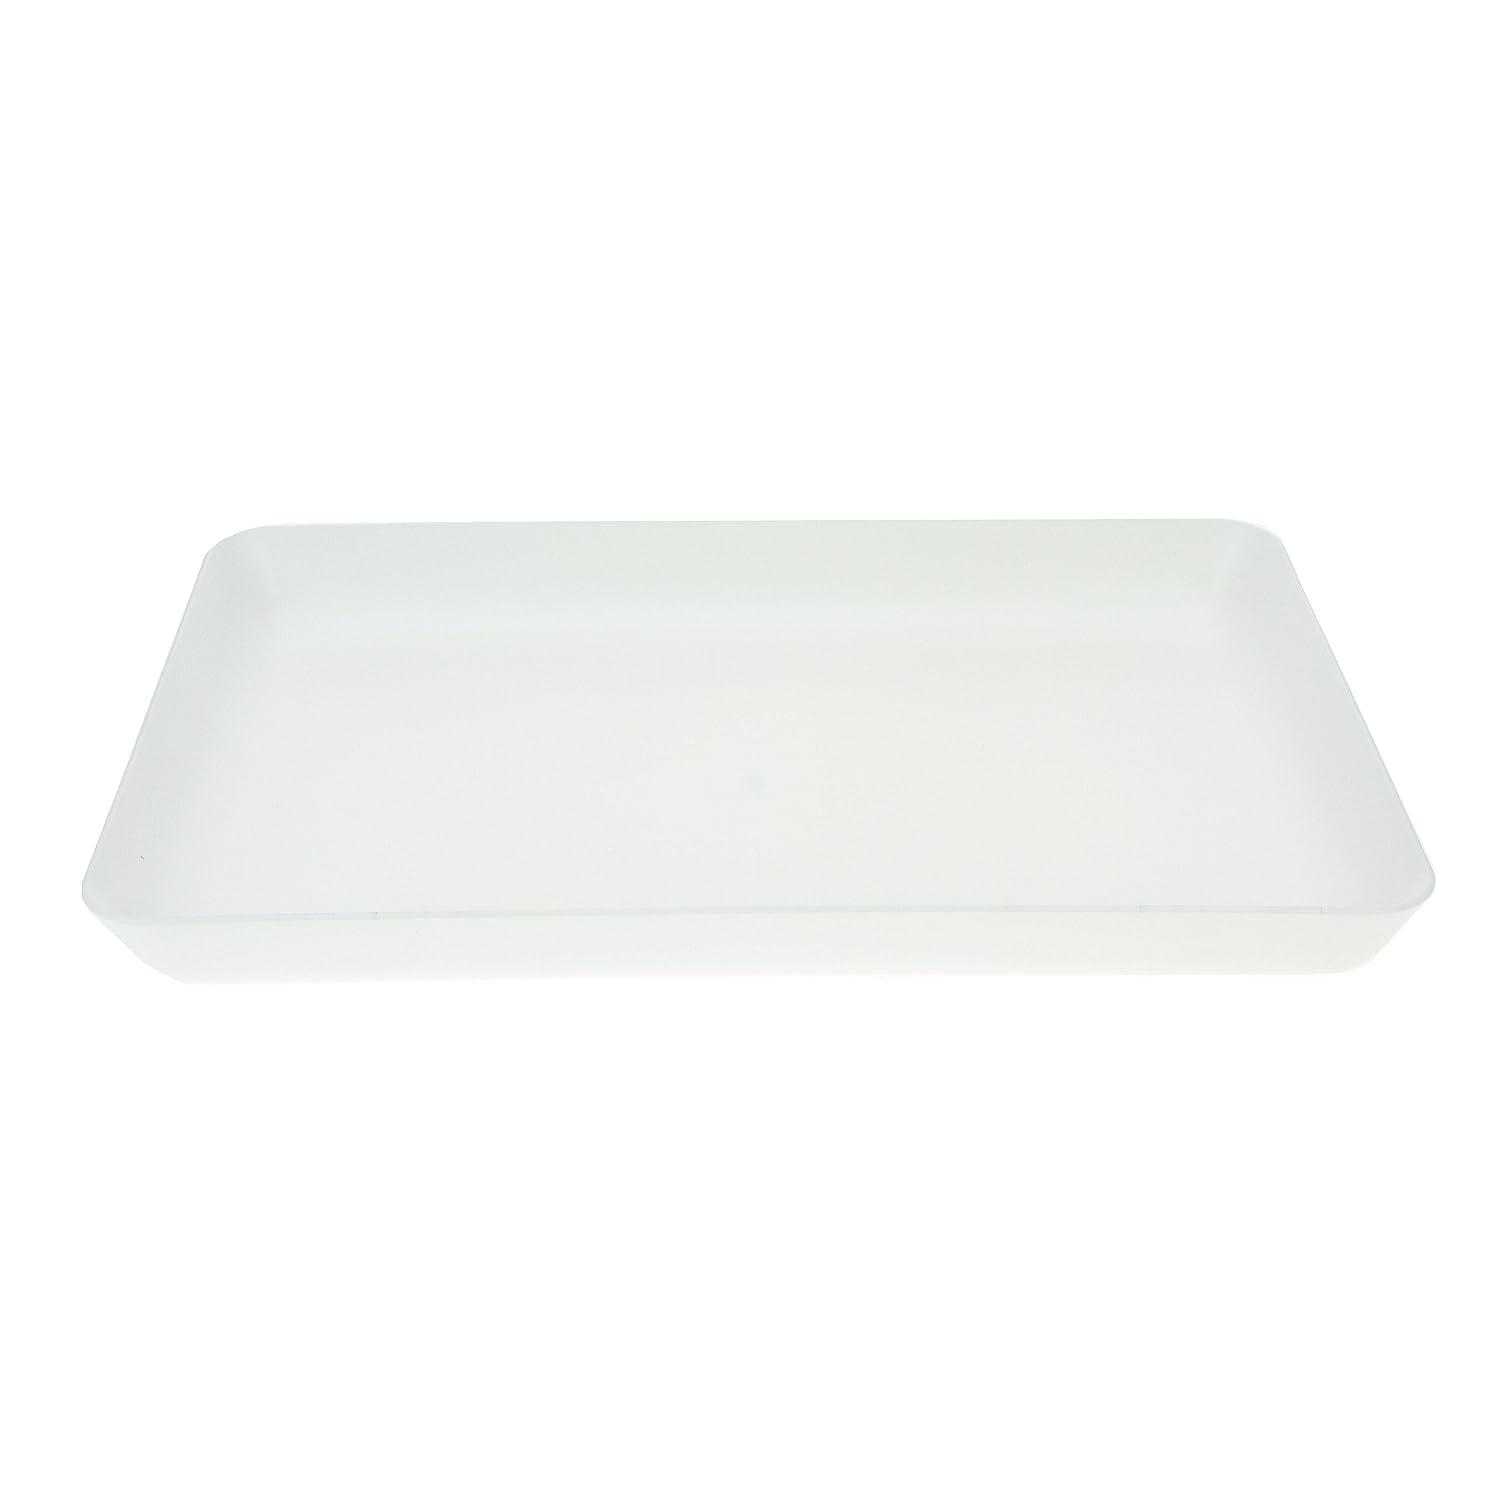 Frisk Peel-Clean Acrylic Palette - Medium